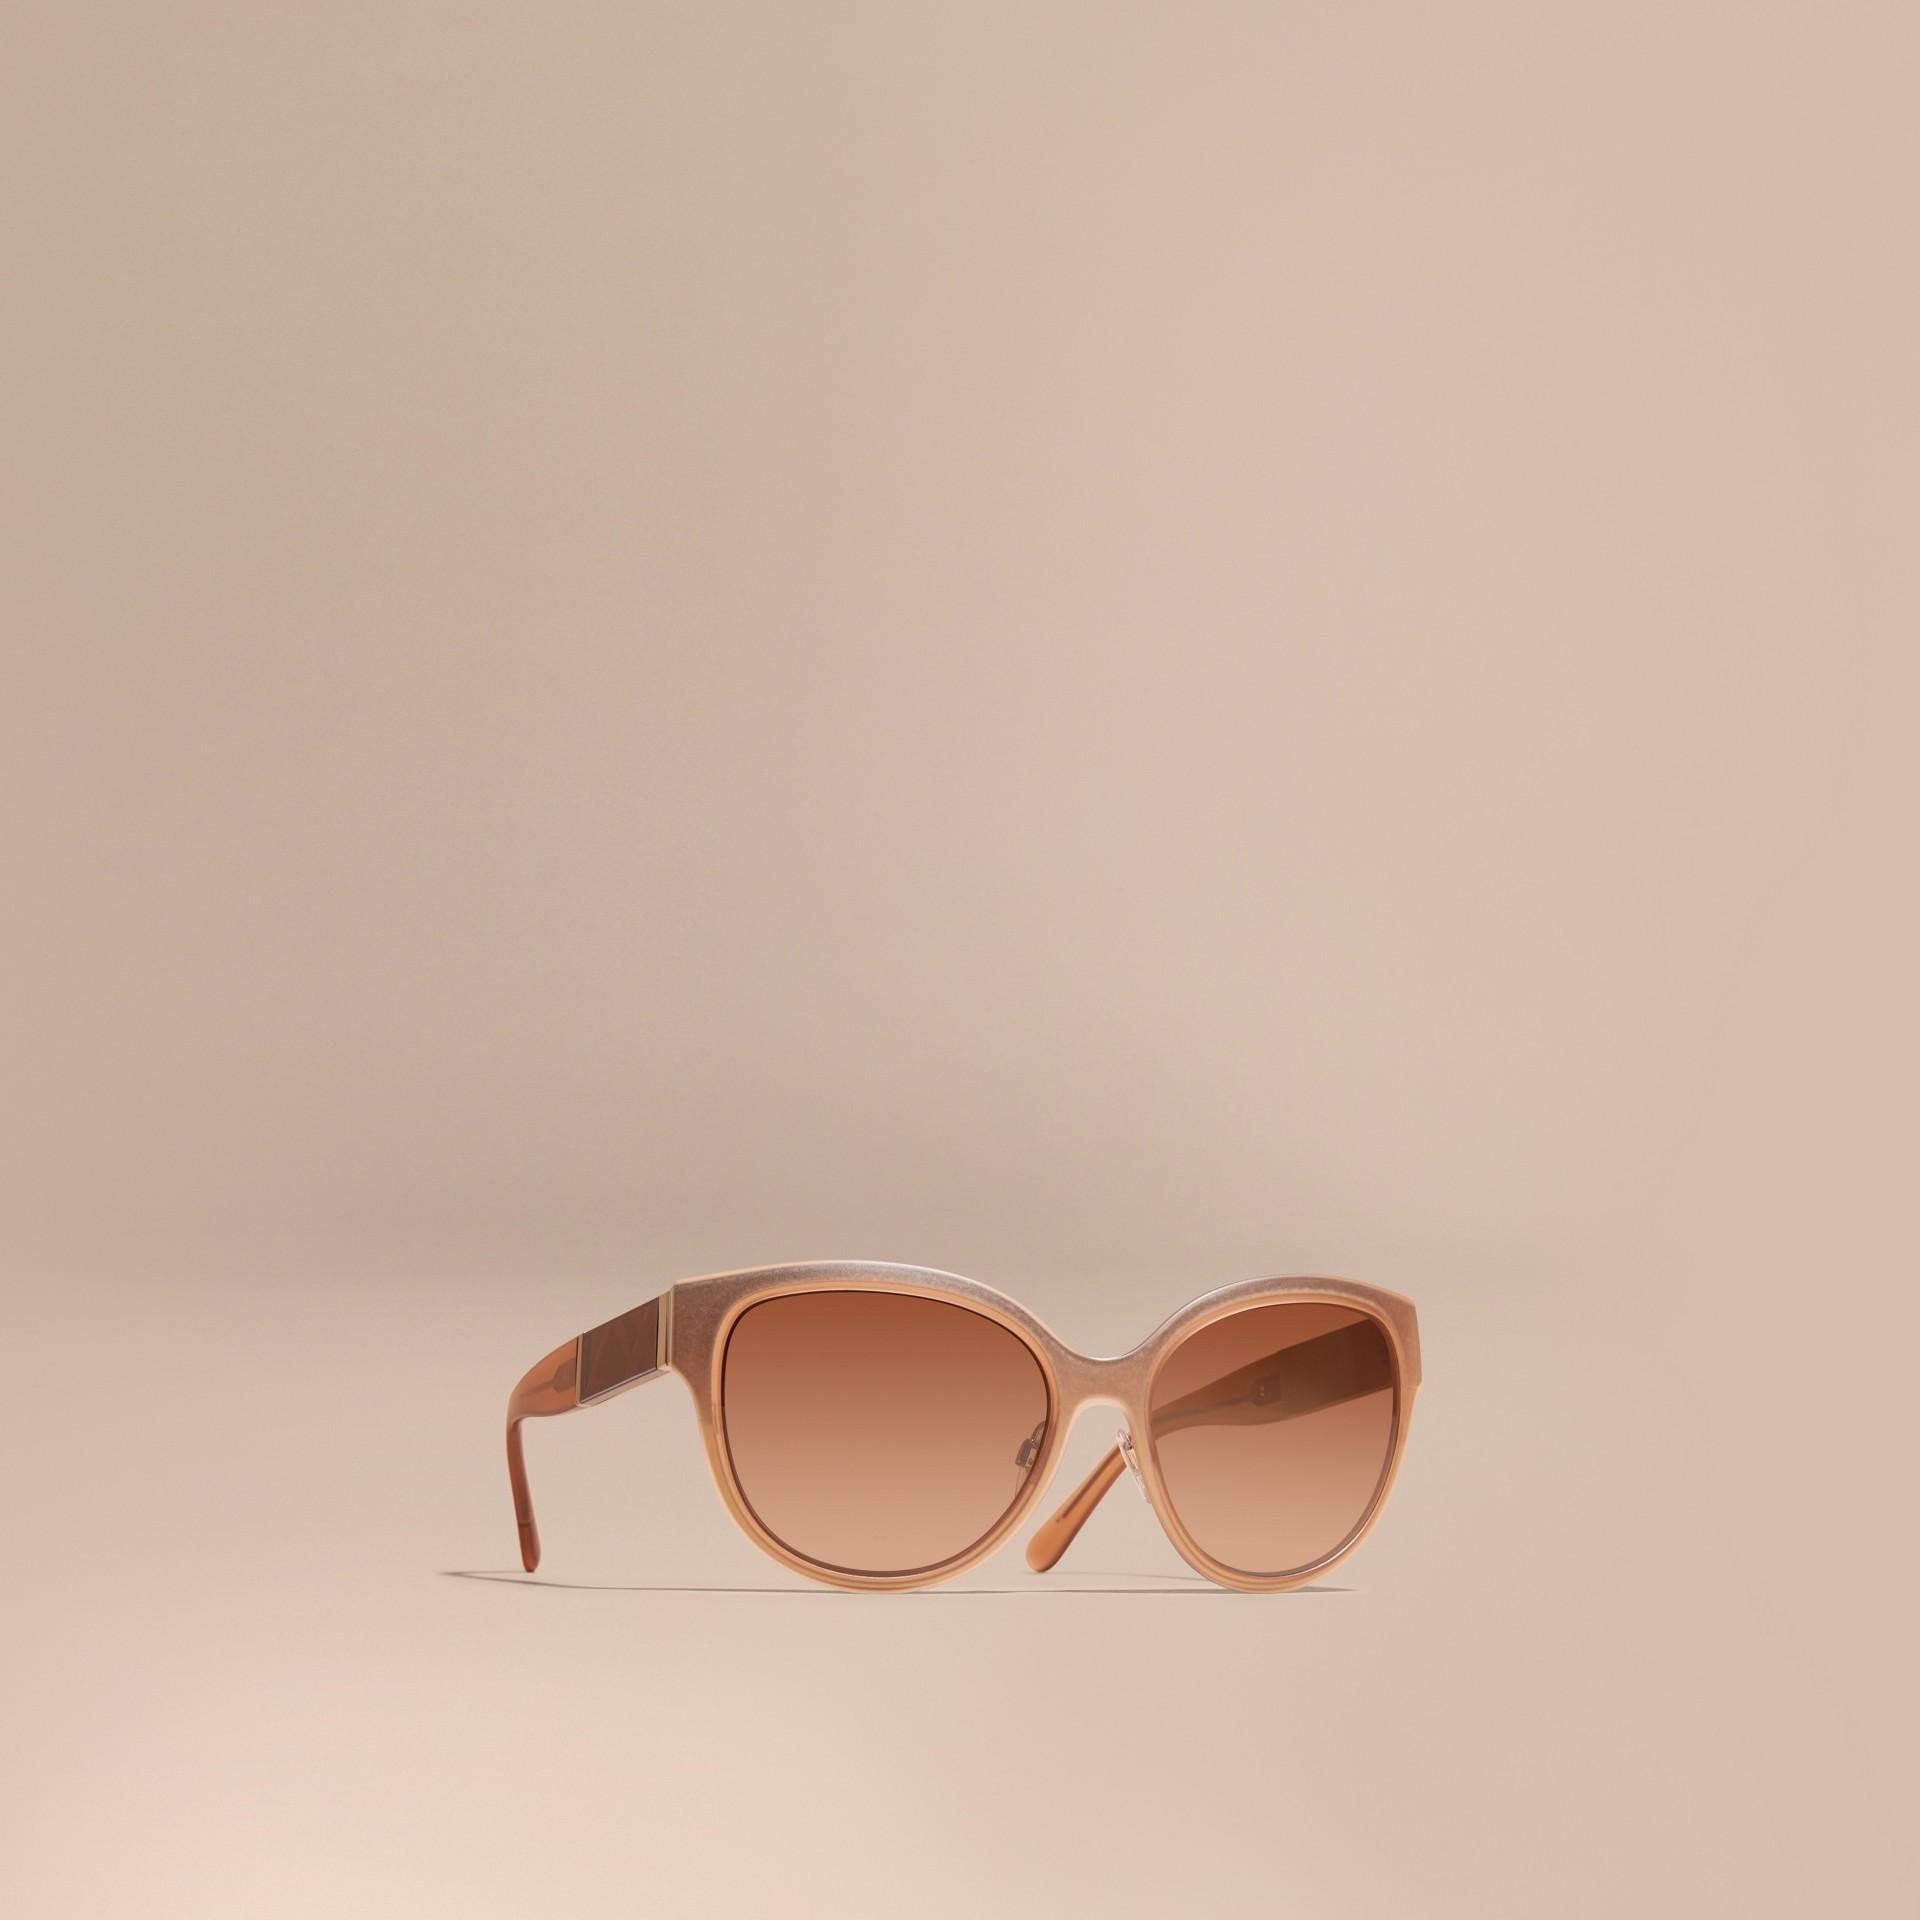 Light wood Check Detail Round Cat-eye Sunglasses Light Wood - gallery image 1